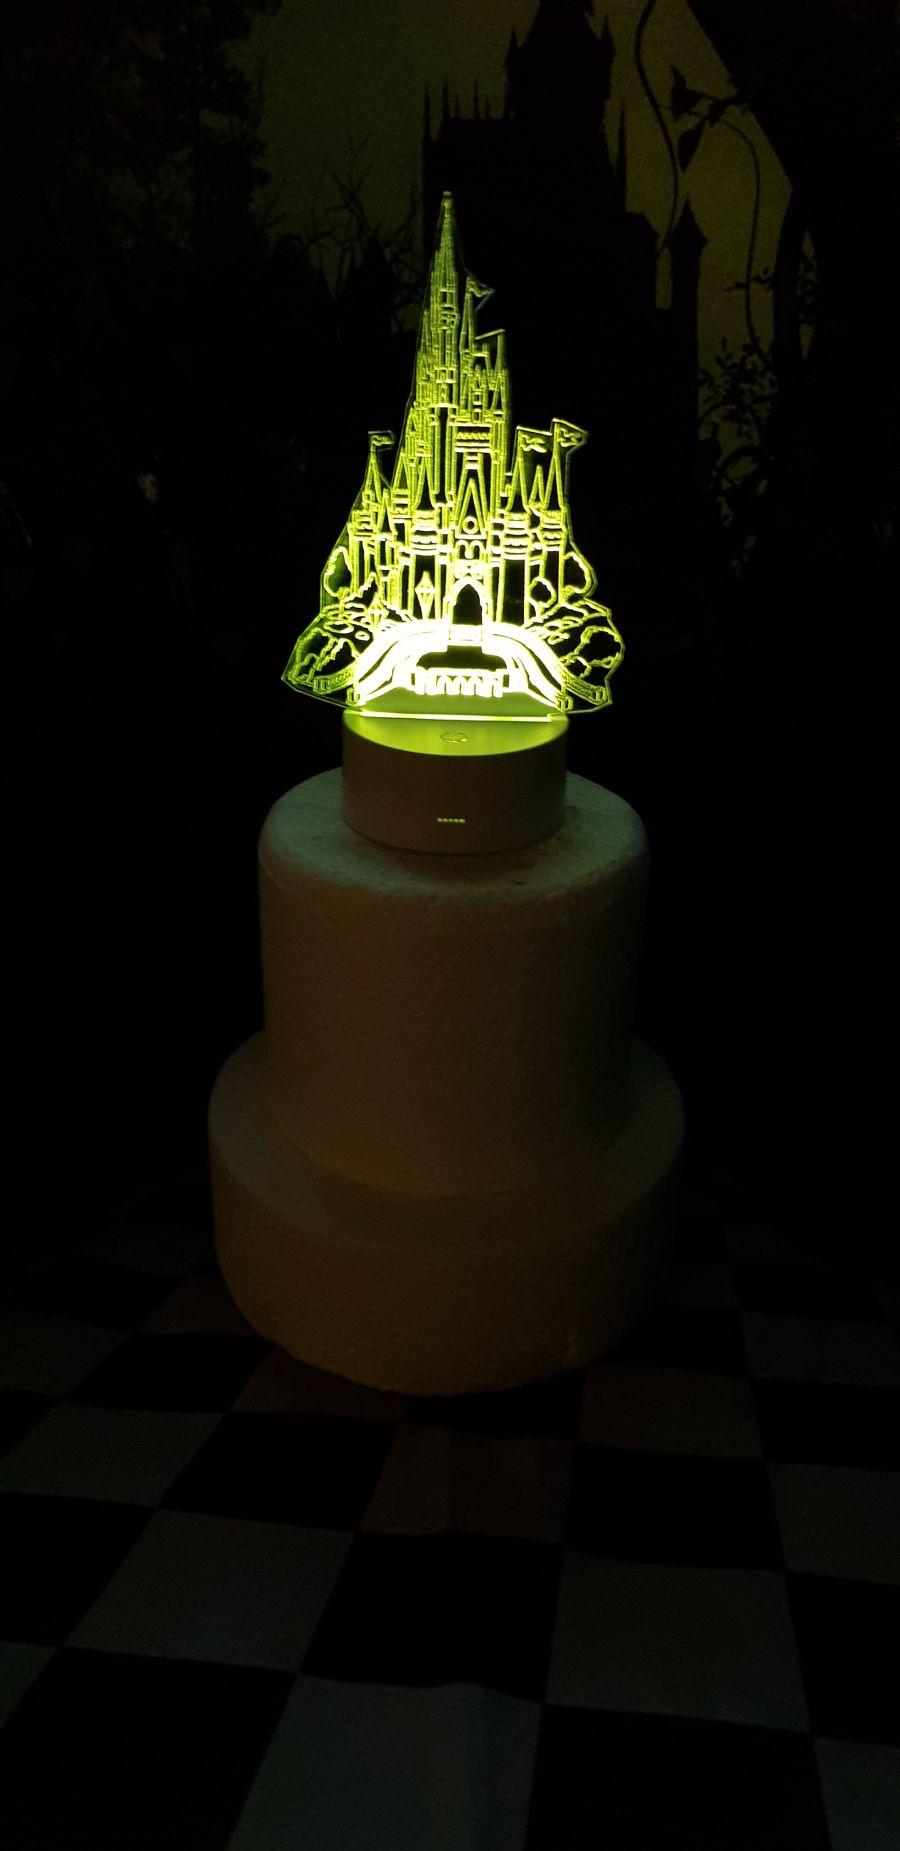 Fairy tail castle light up cake topper night light